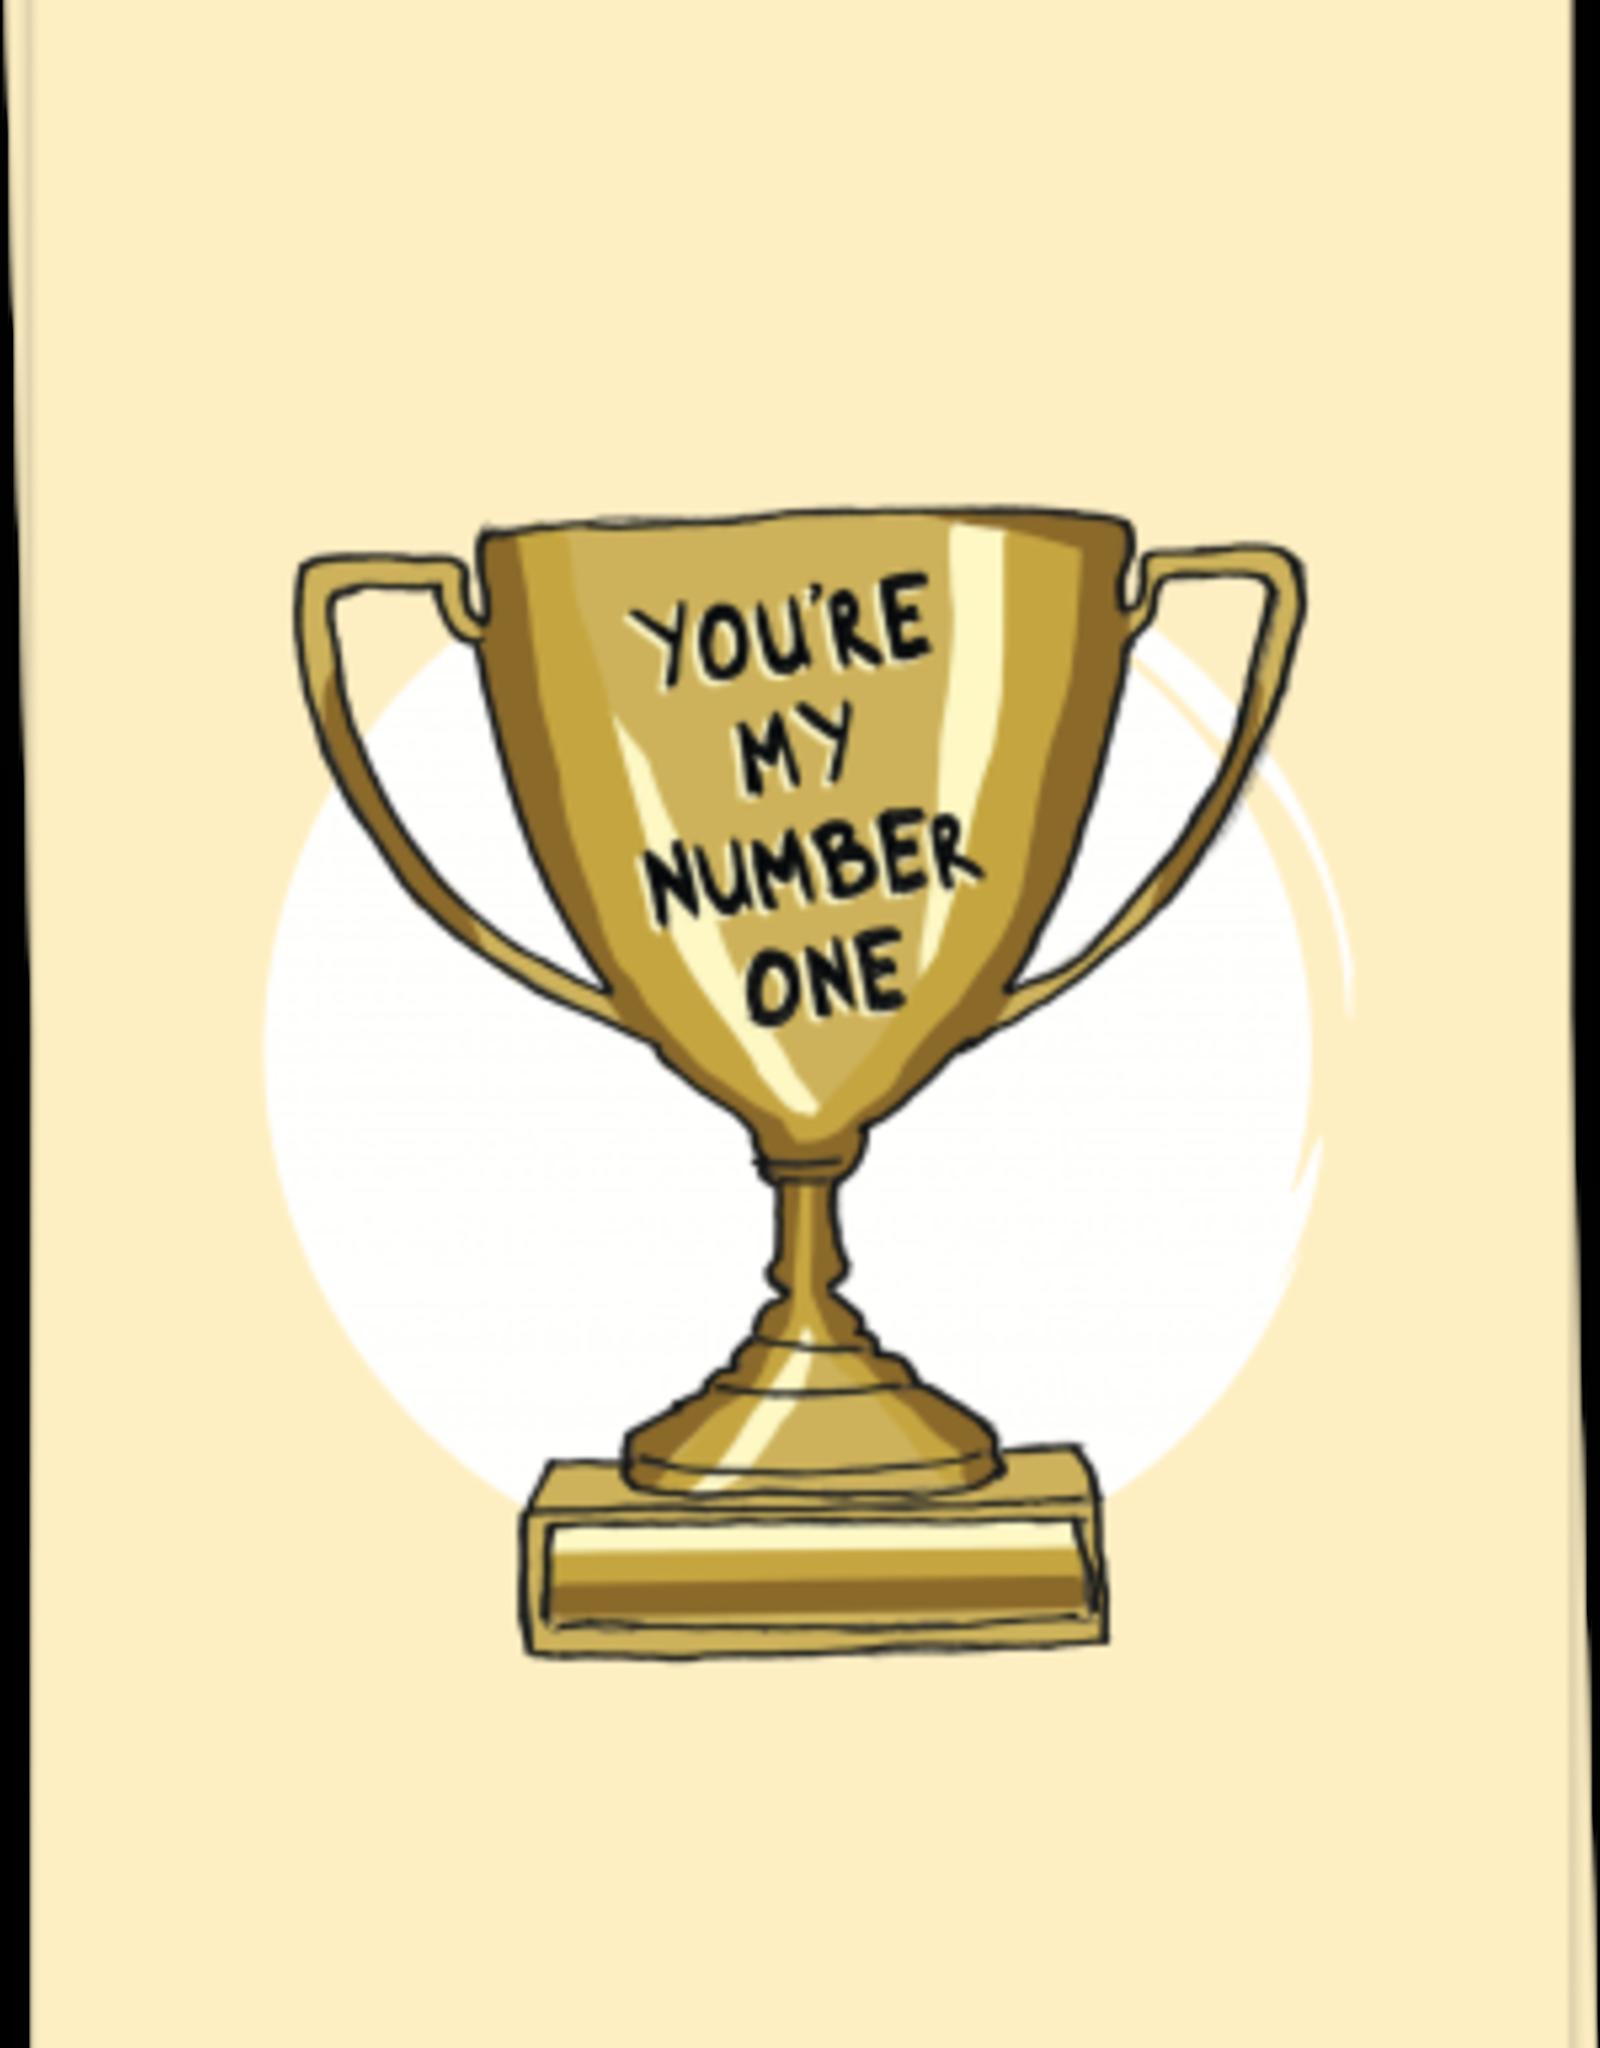 kaart Blanche Kaart Blanche: kaart a6 + envelop you're my number one